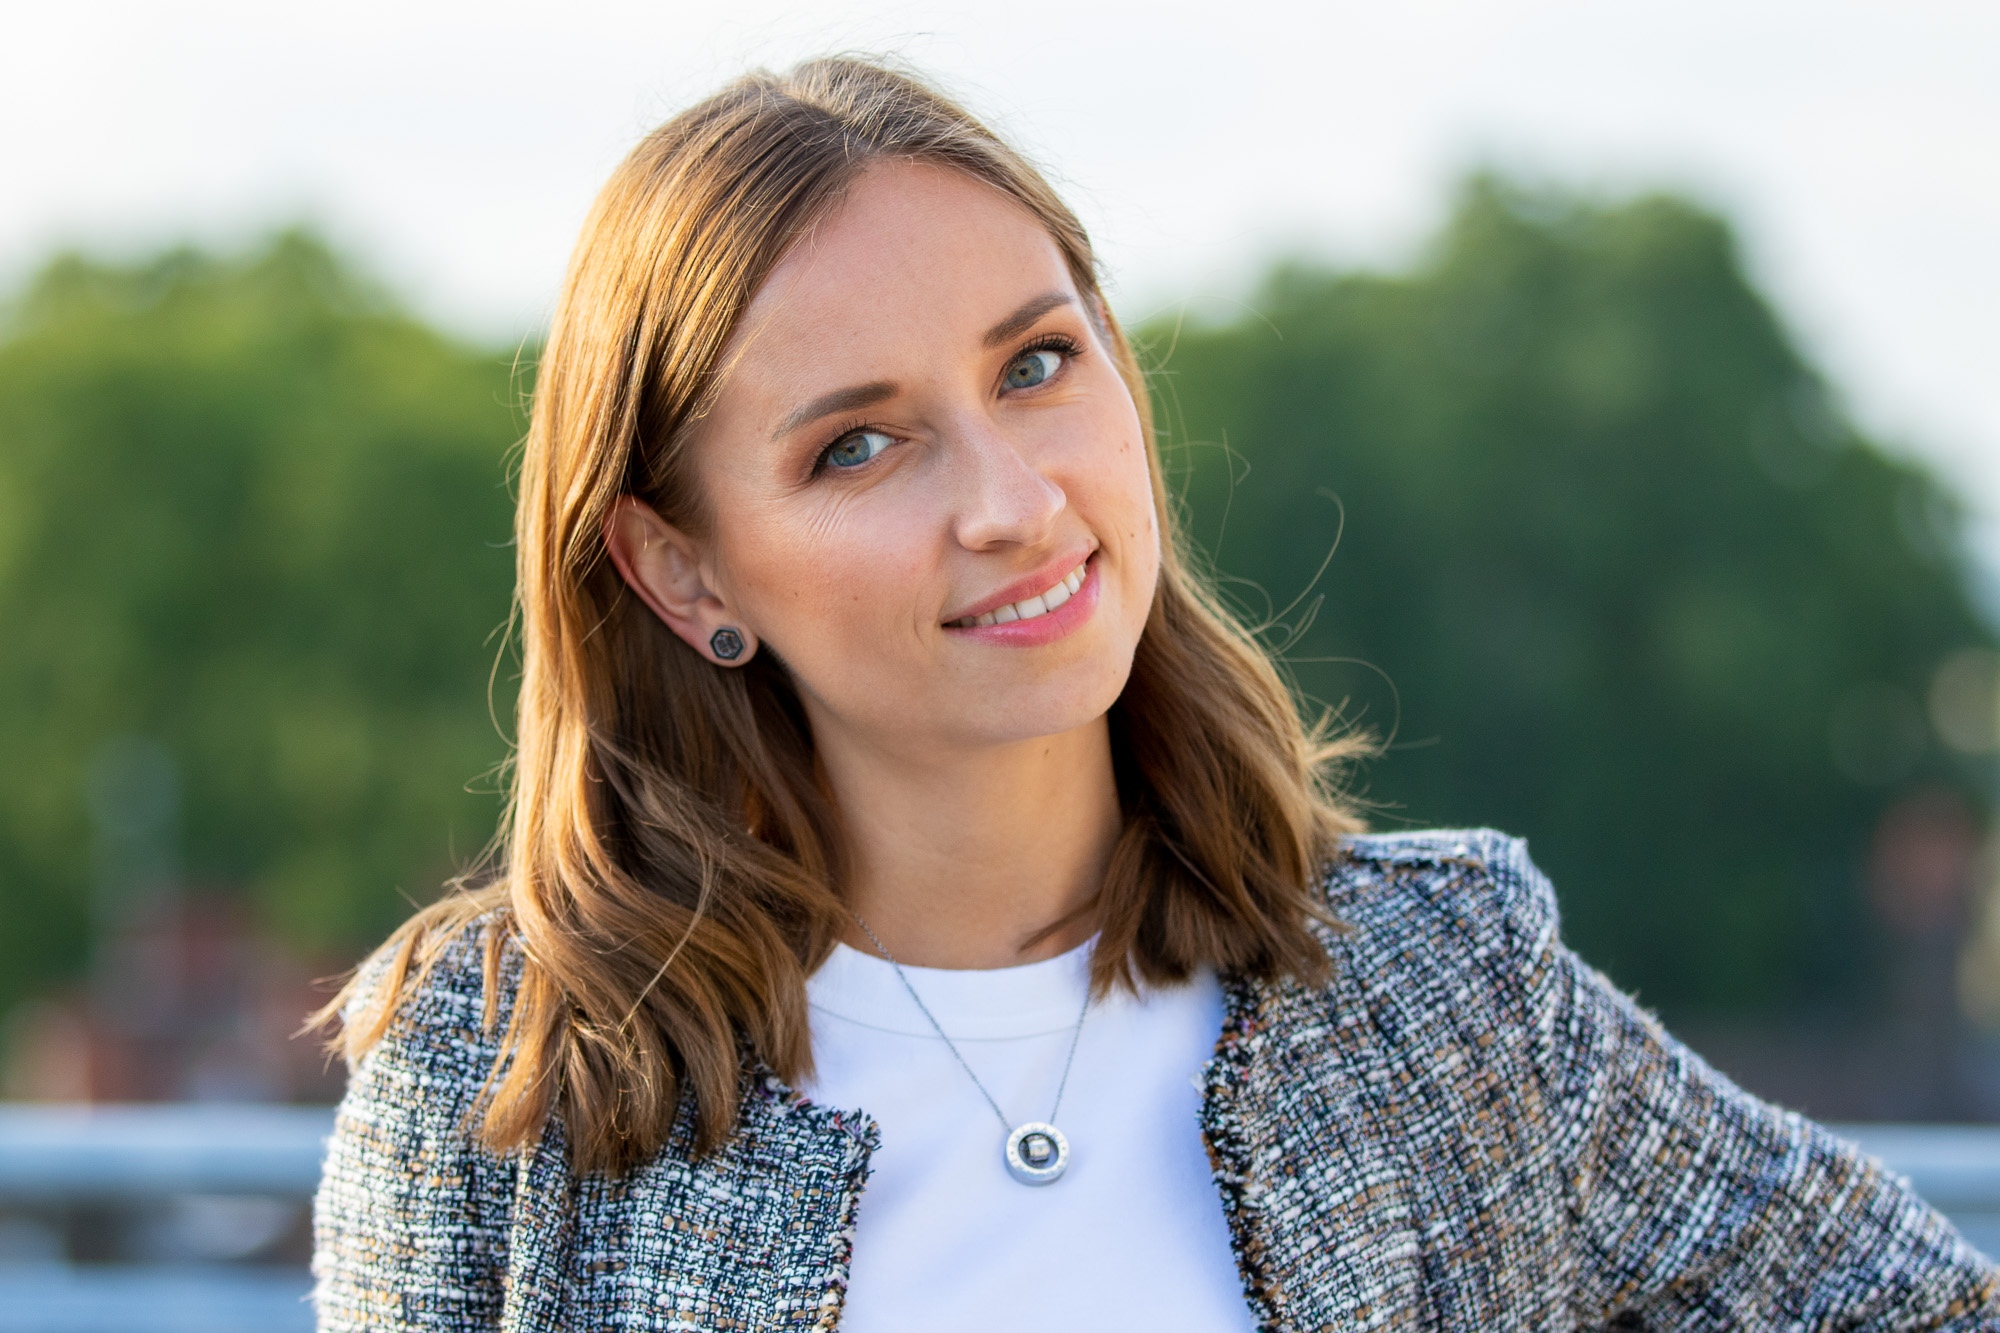 Sofiya Avaeva